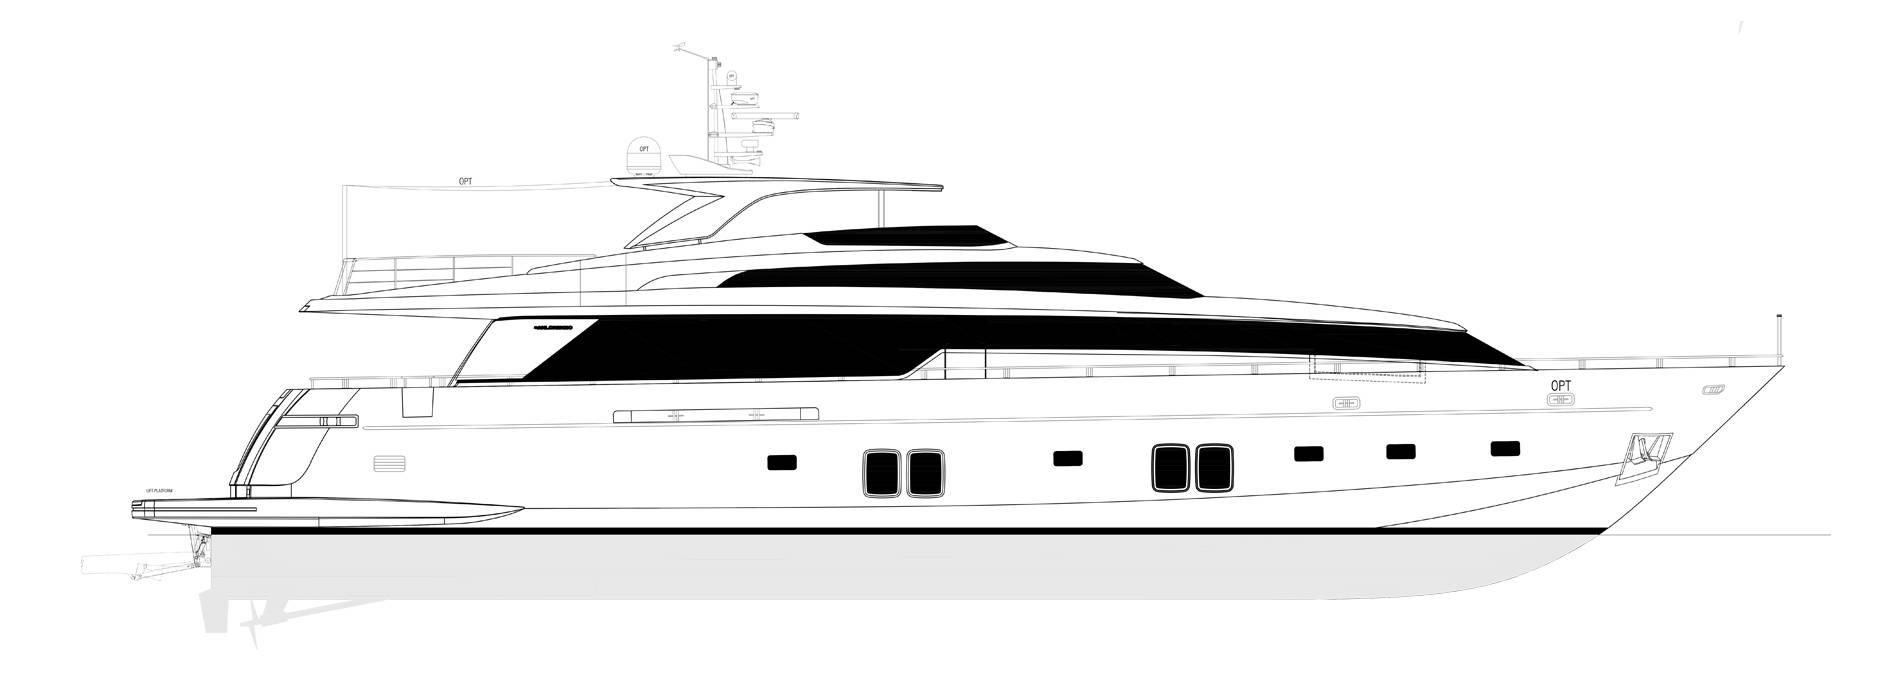 Sanlorenzo Yachts SL106-725 外观